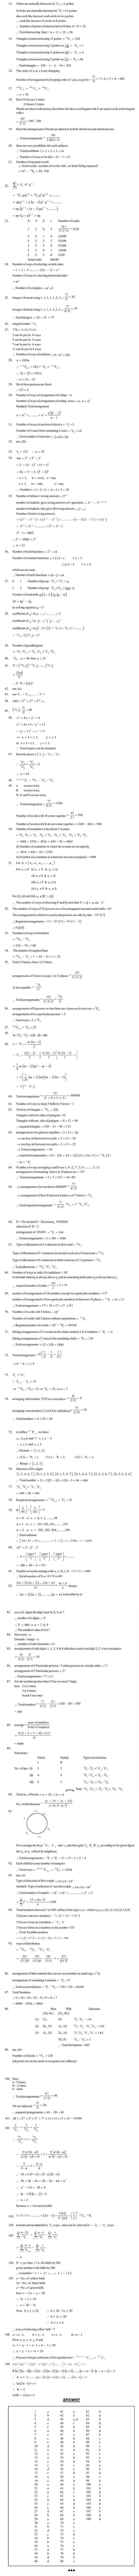 JEE Question Bank Maths - Permutation adn Combination